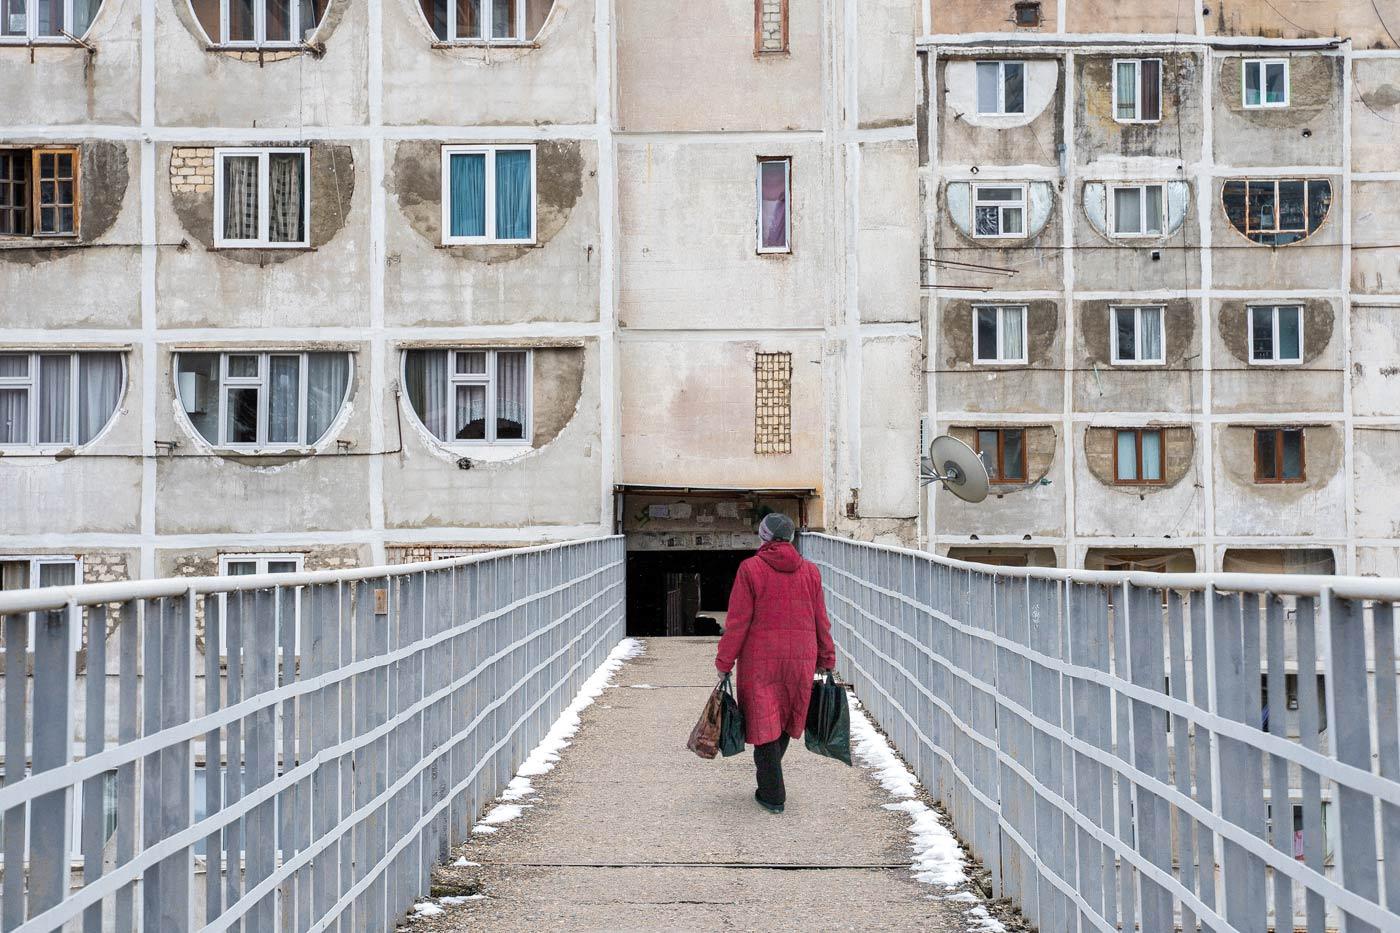 'Sky-Bridge' Housing Estate in Tbilisi, Georgia